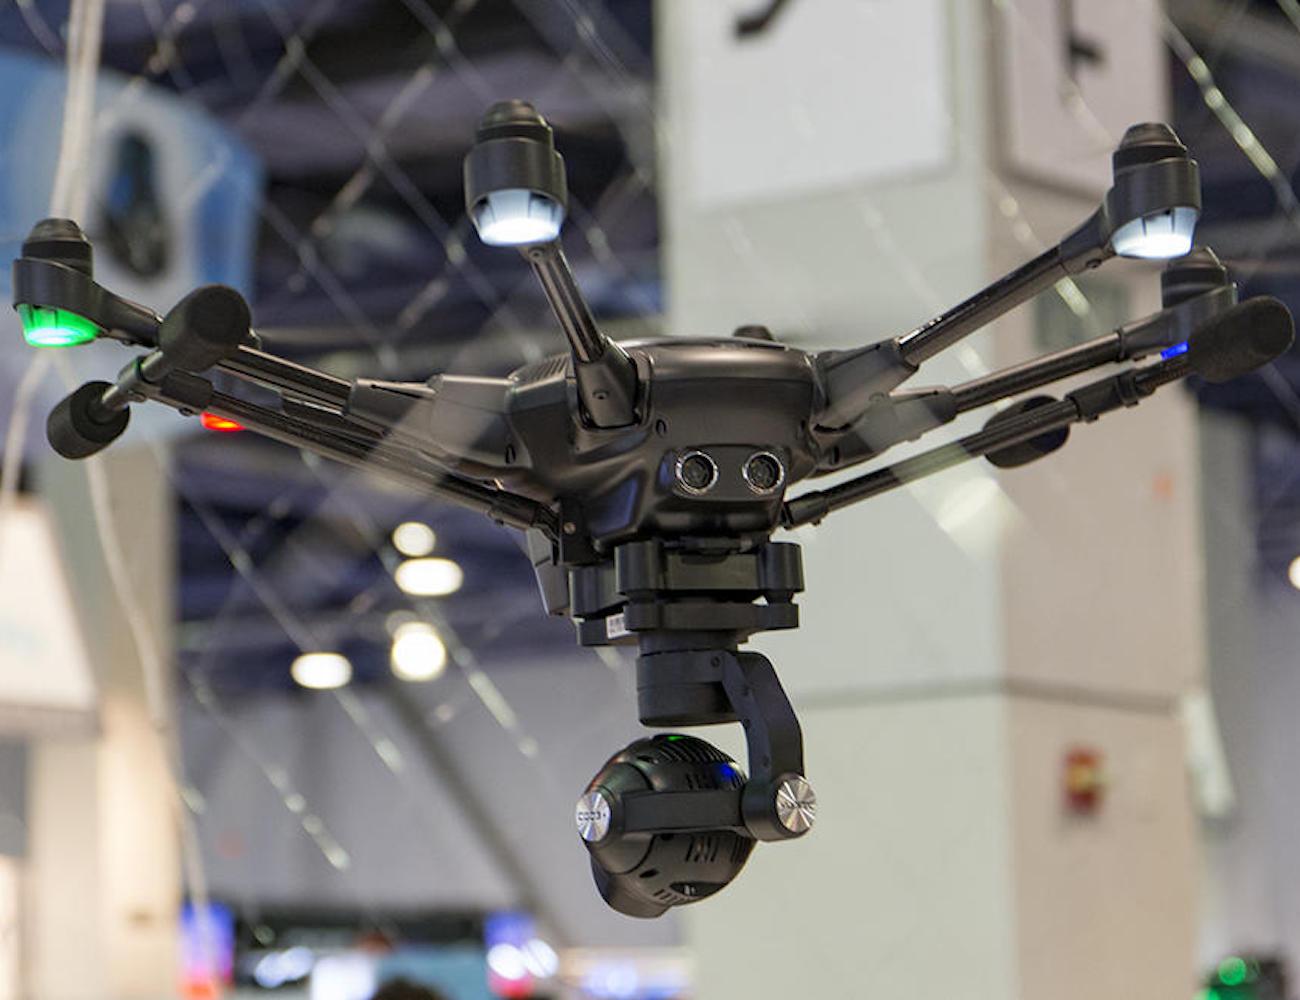 Typhoon H Intelligent 4K Drone by Yuneec